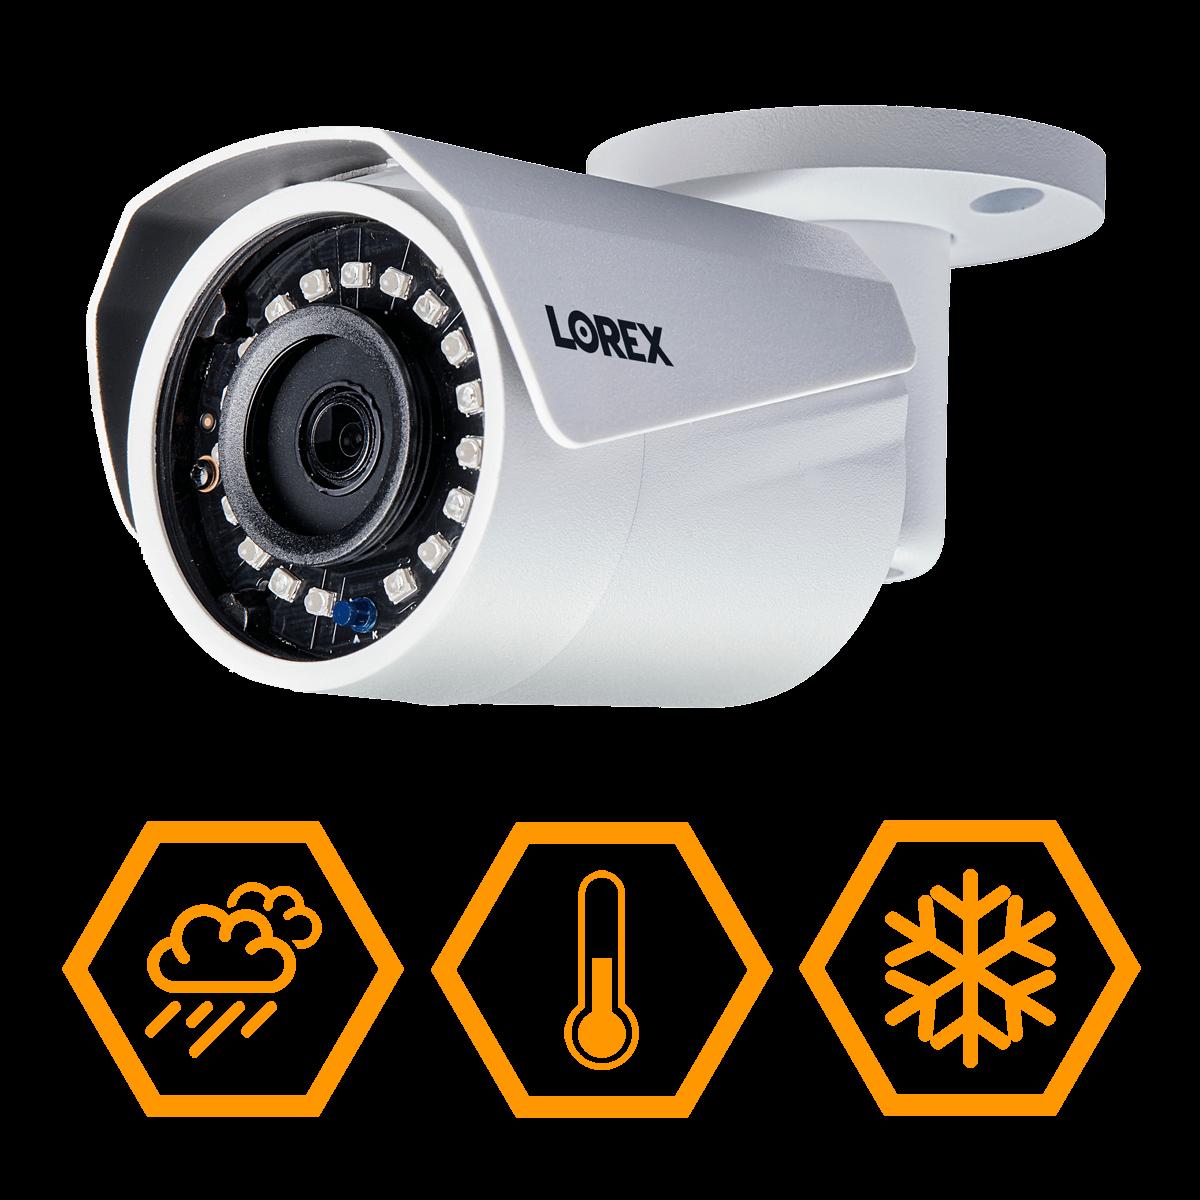 IP66 weatherproof security cameras from Lorex